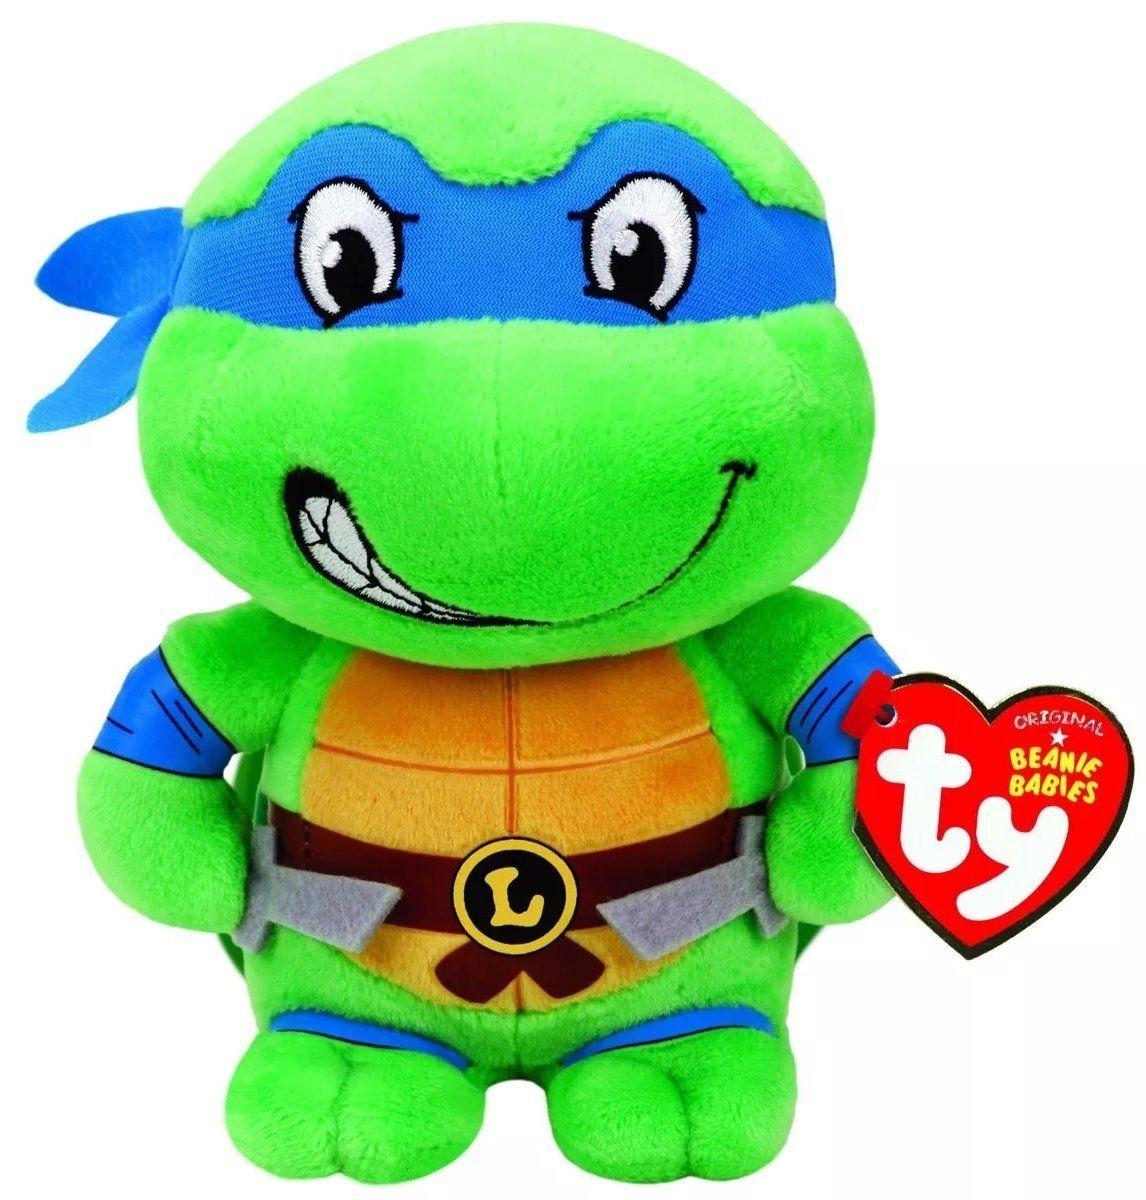 Pelúcia Leonardo: Tartarugas Ninja (Ty Beanies) - DTC